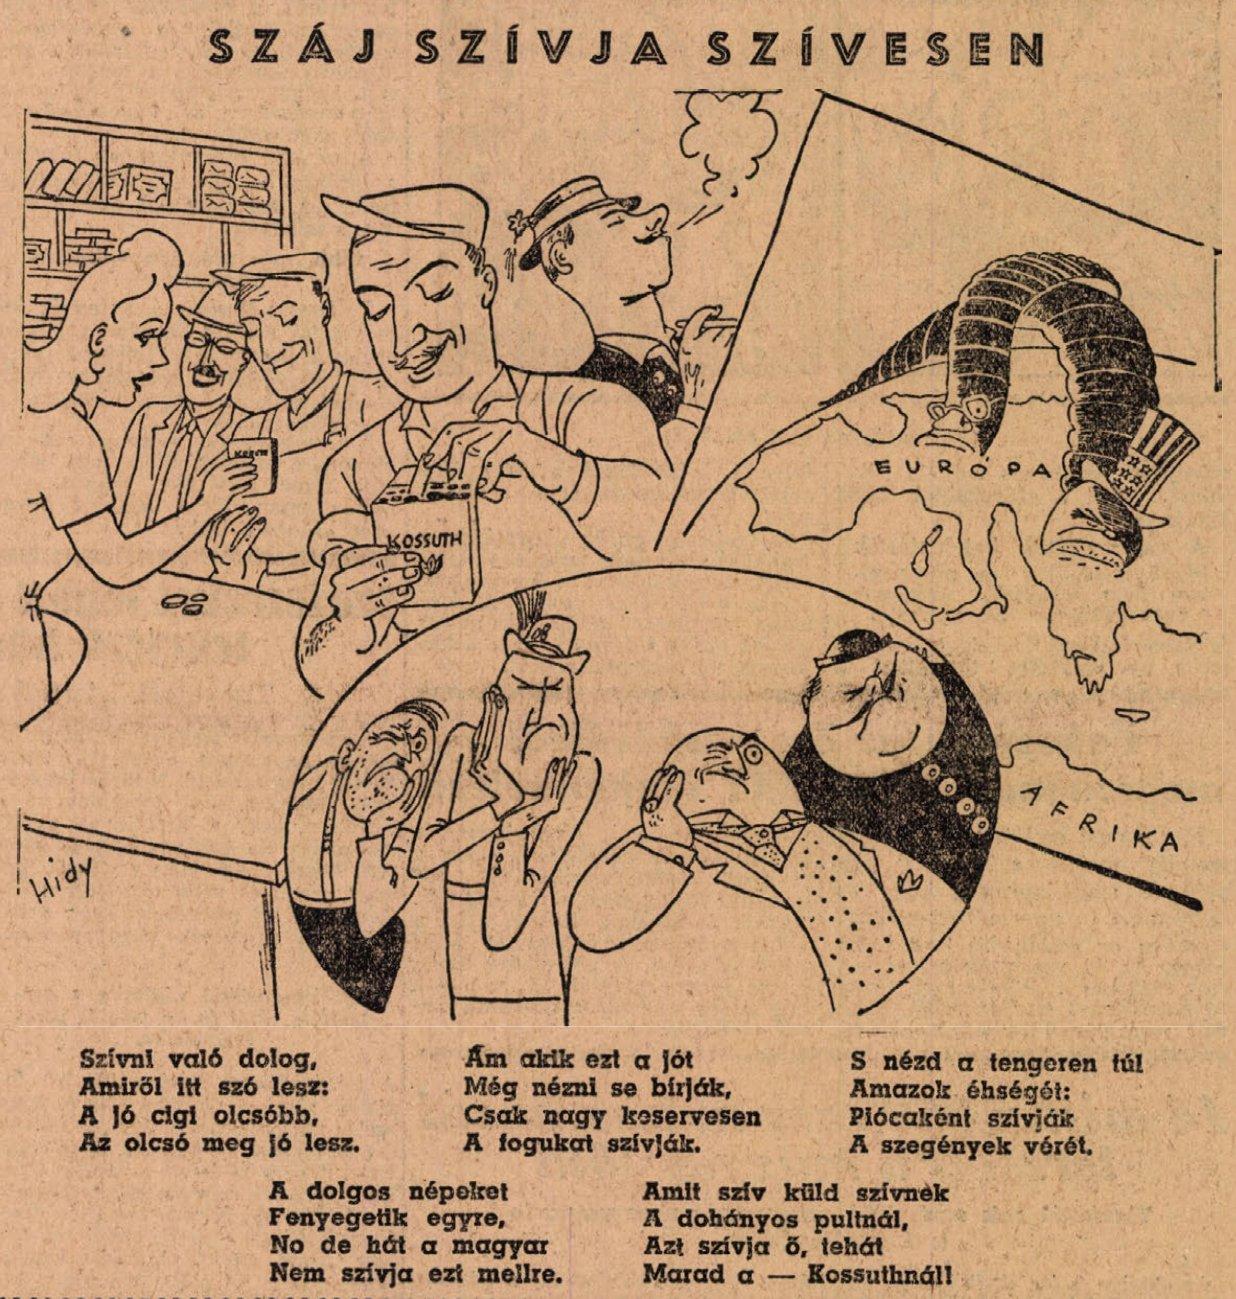 kossuth_cigaretta_politikai_propaganda1948.jpg